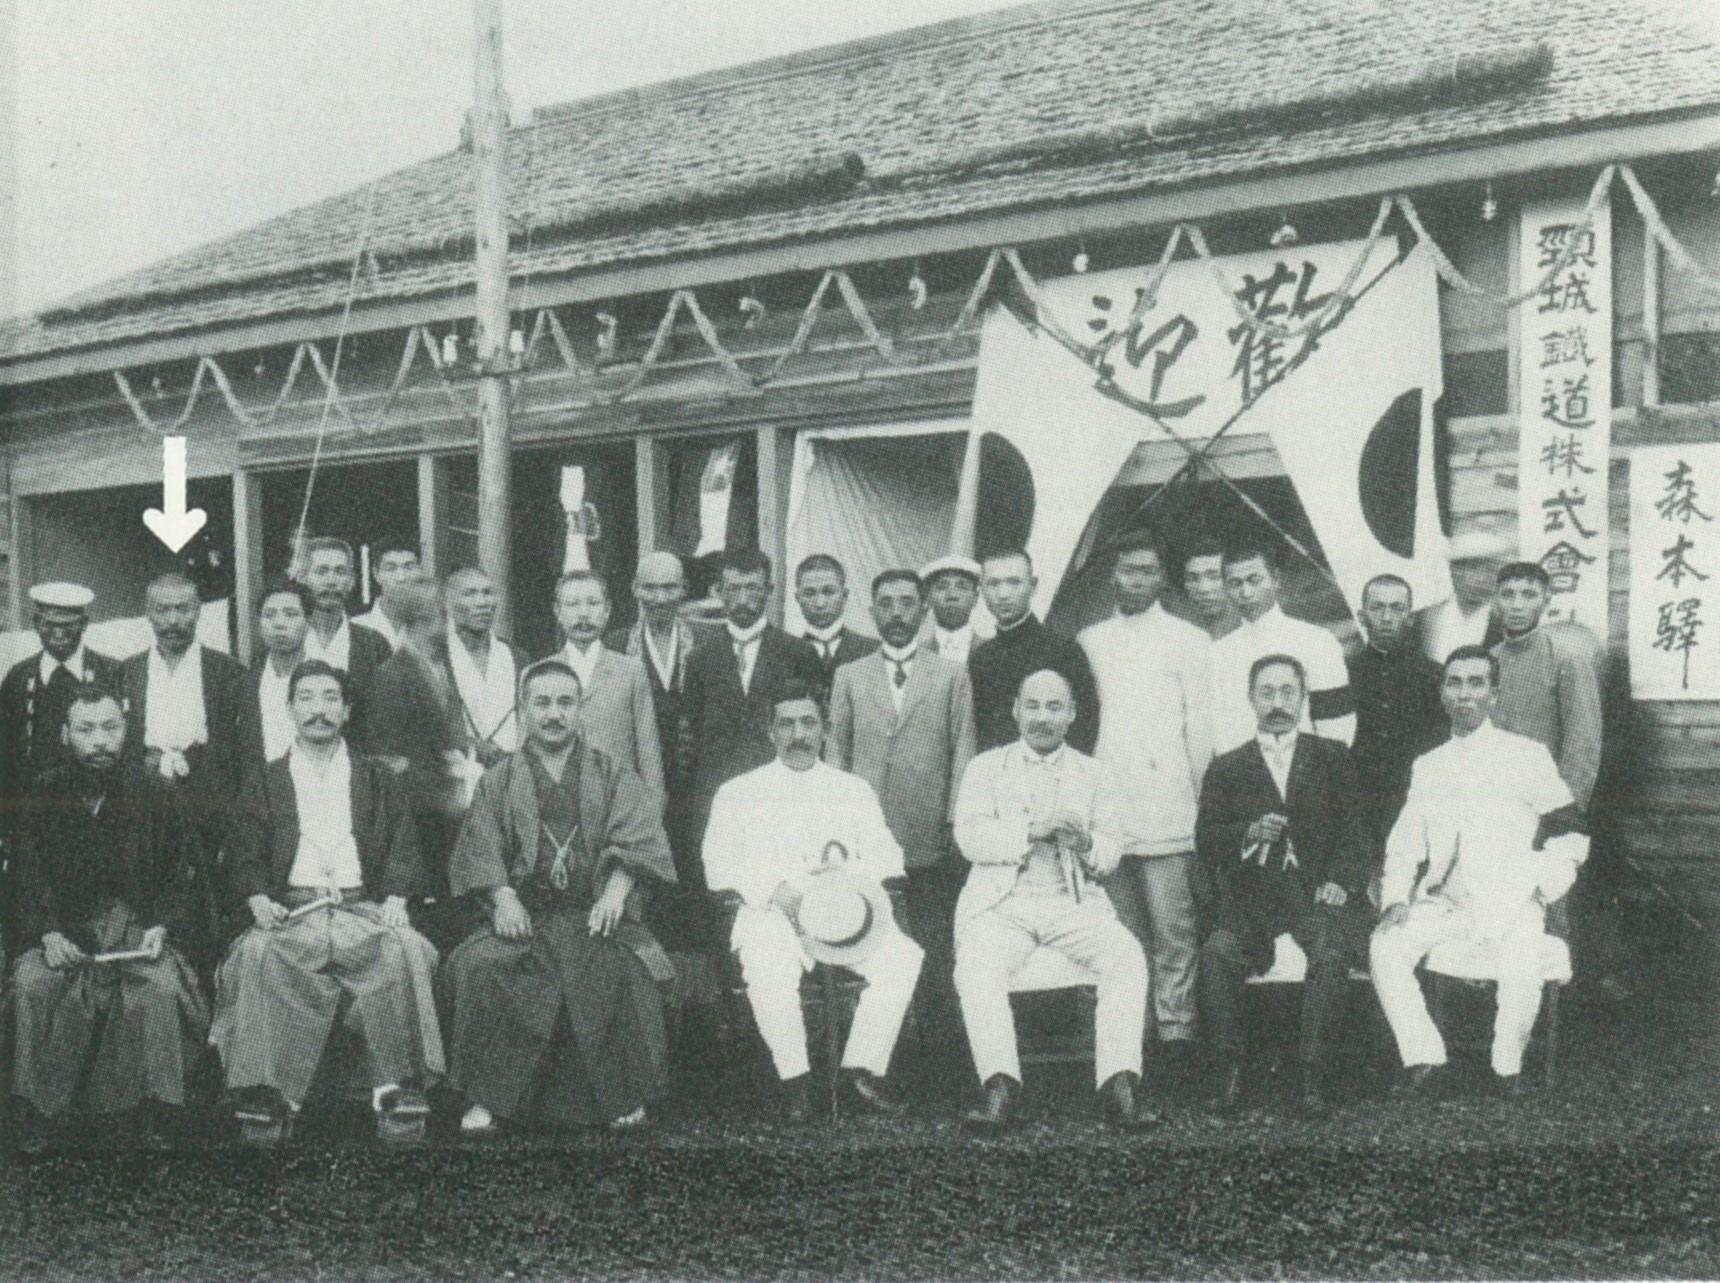 森本駅鉄道視察(大正3年)後列左から2番目が古田文治